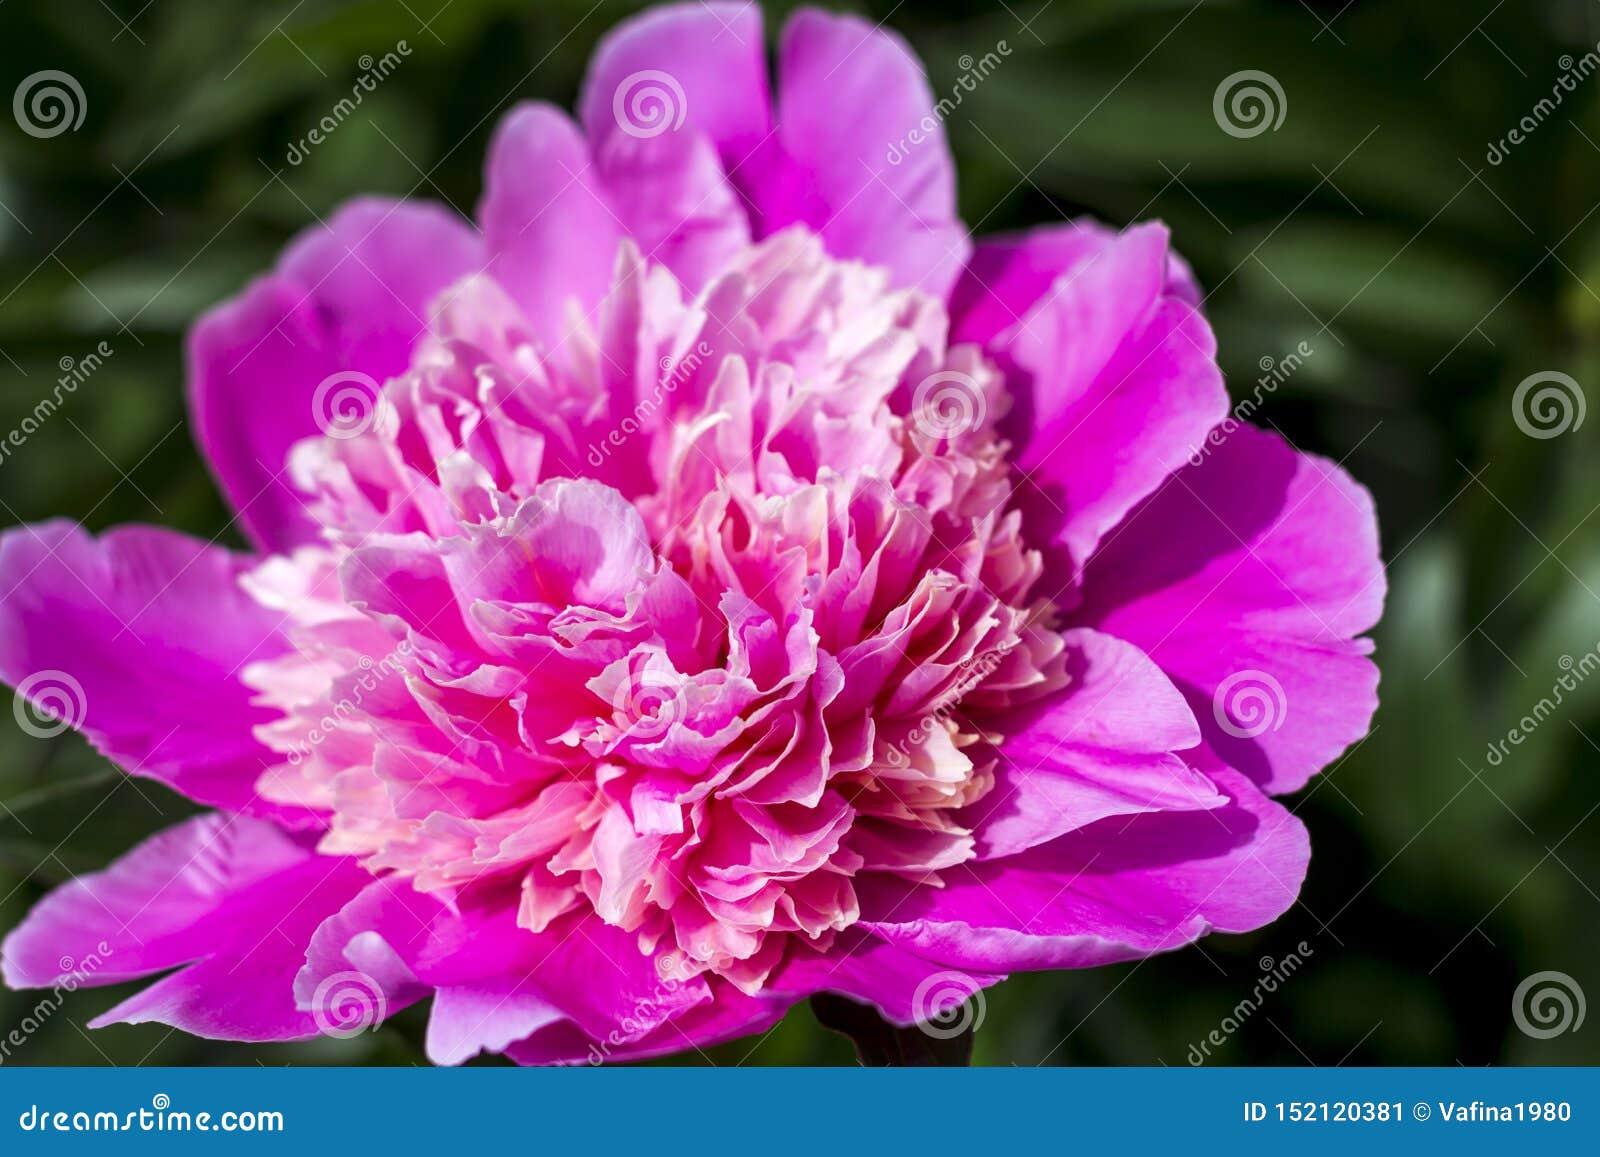 Bloeiende roze pioen in de de zomertuin